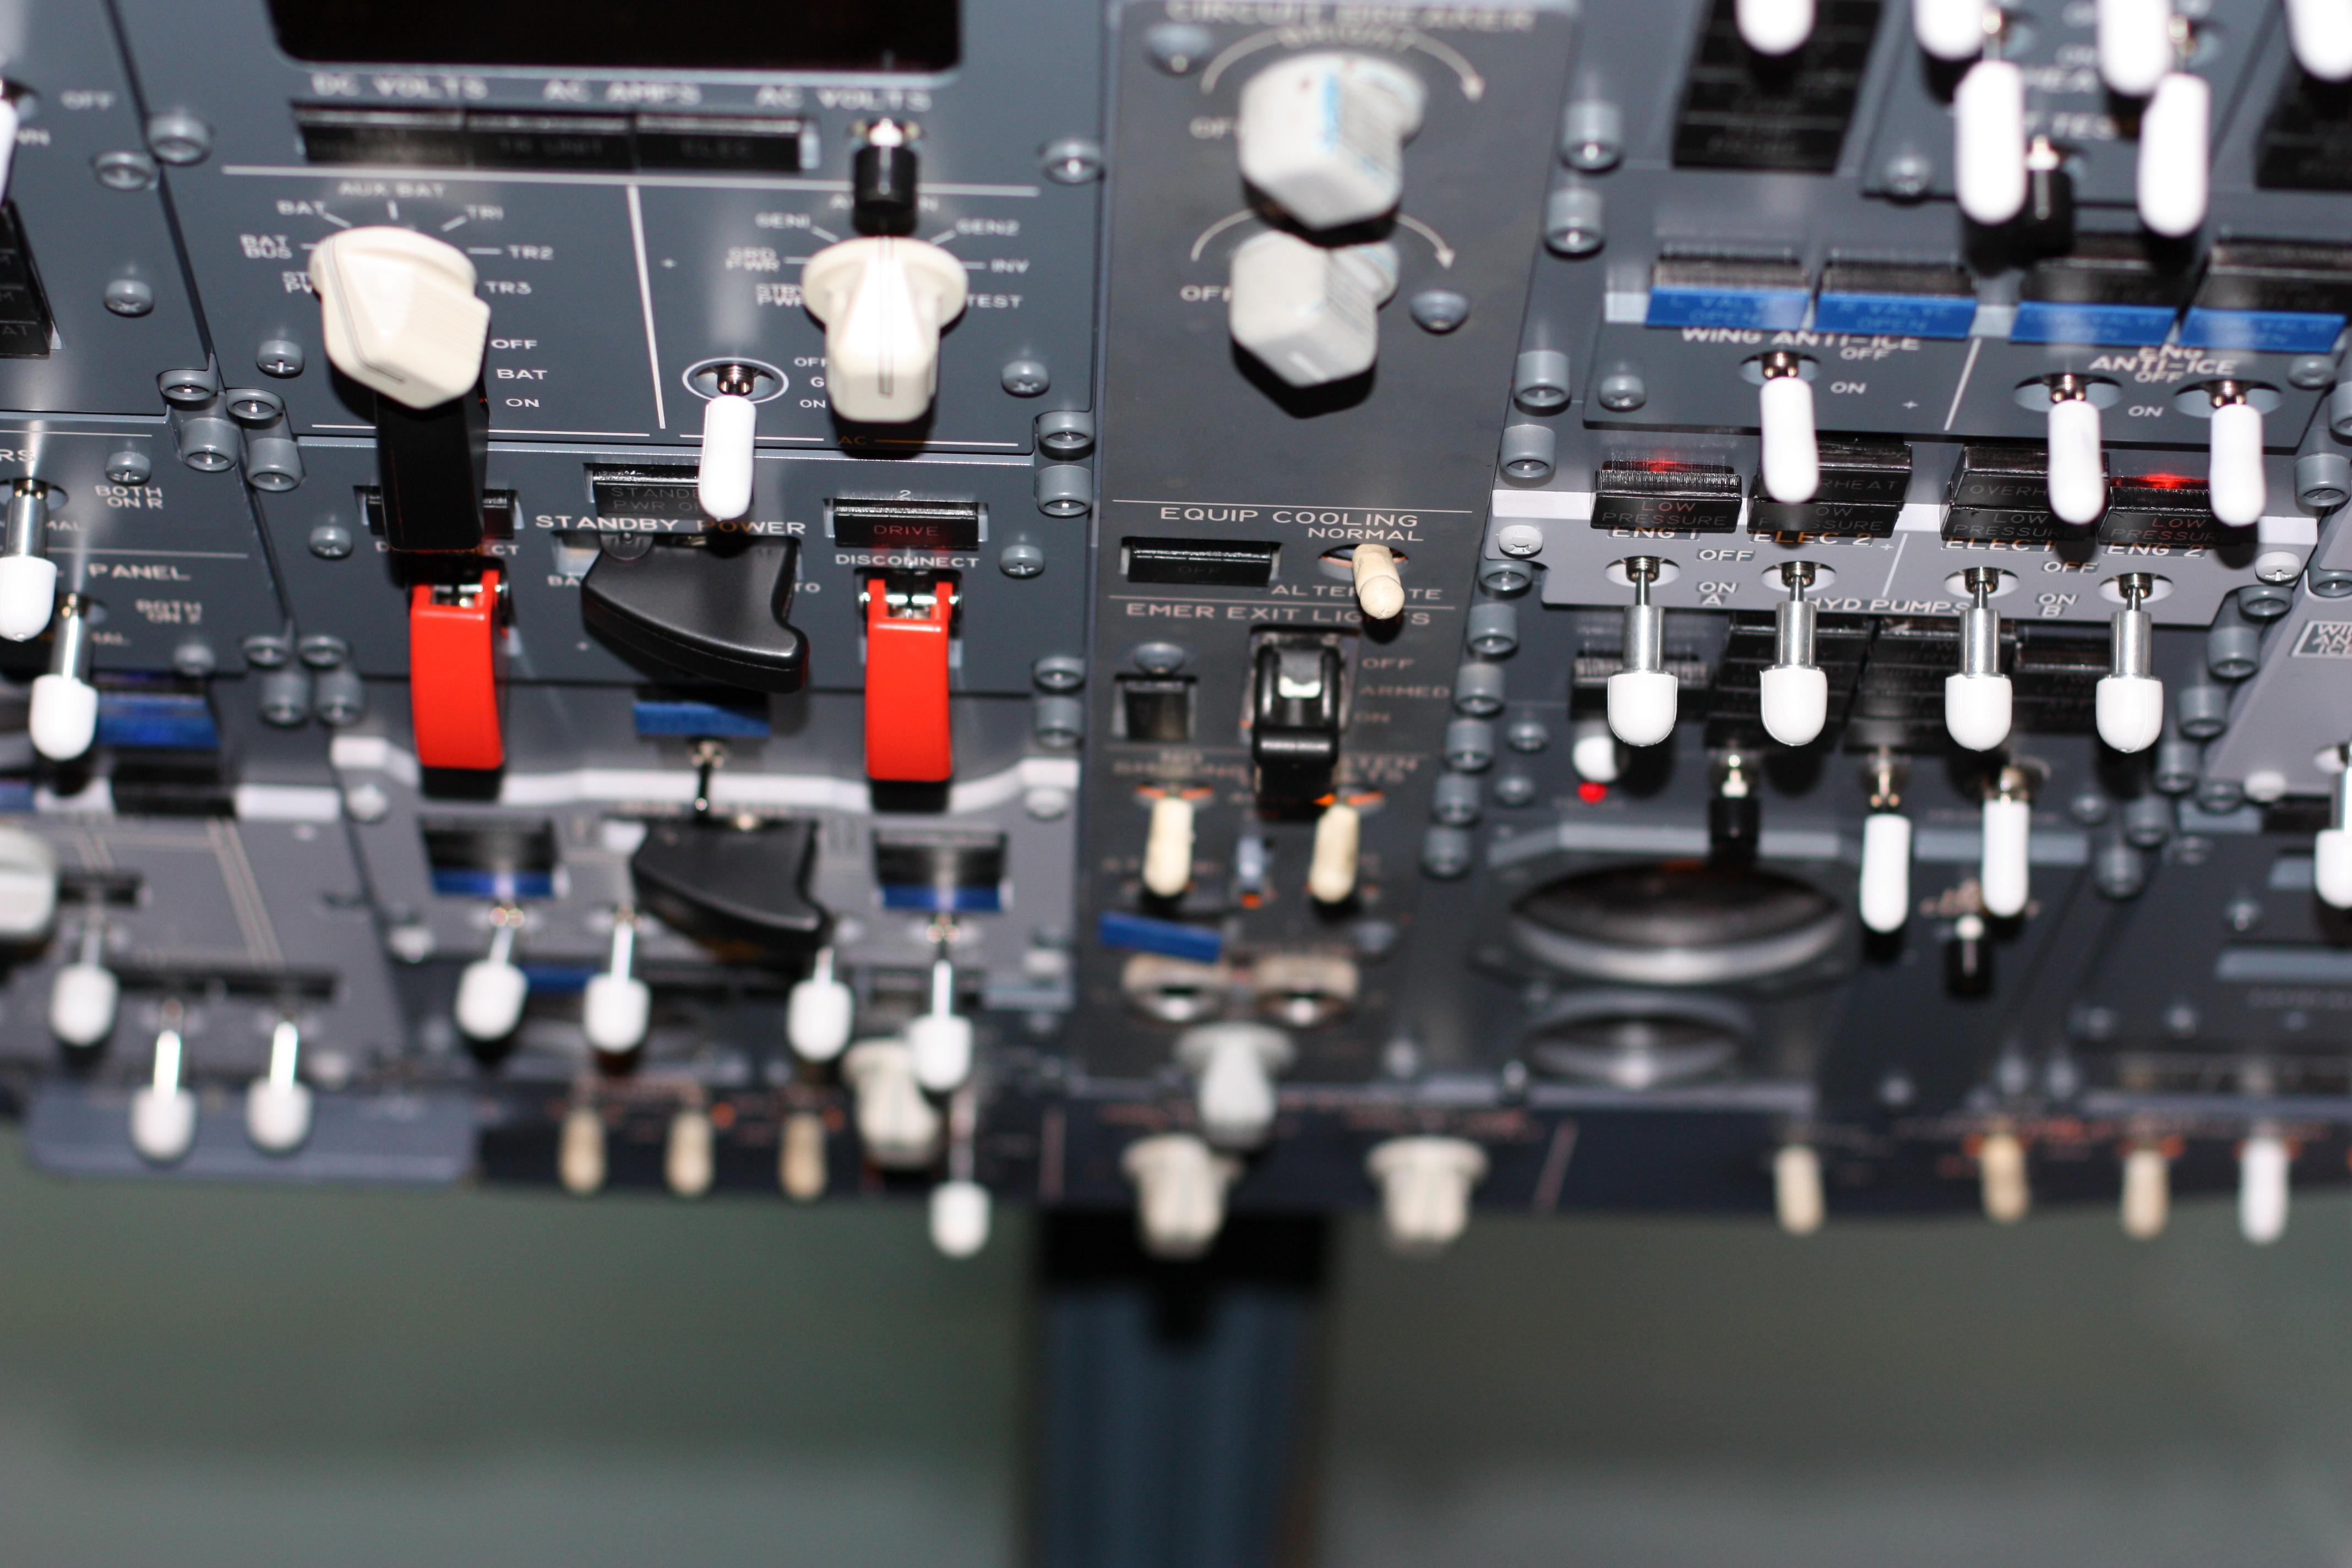 File:Cockpit of Boeing 737 700 Flight Simulator in Berlin